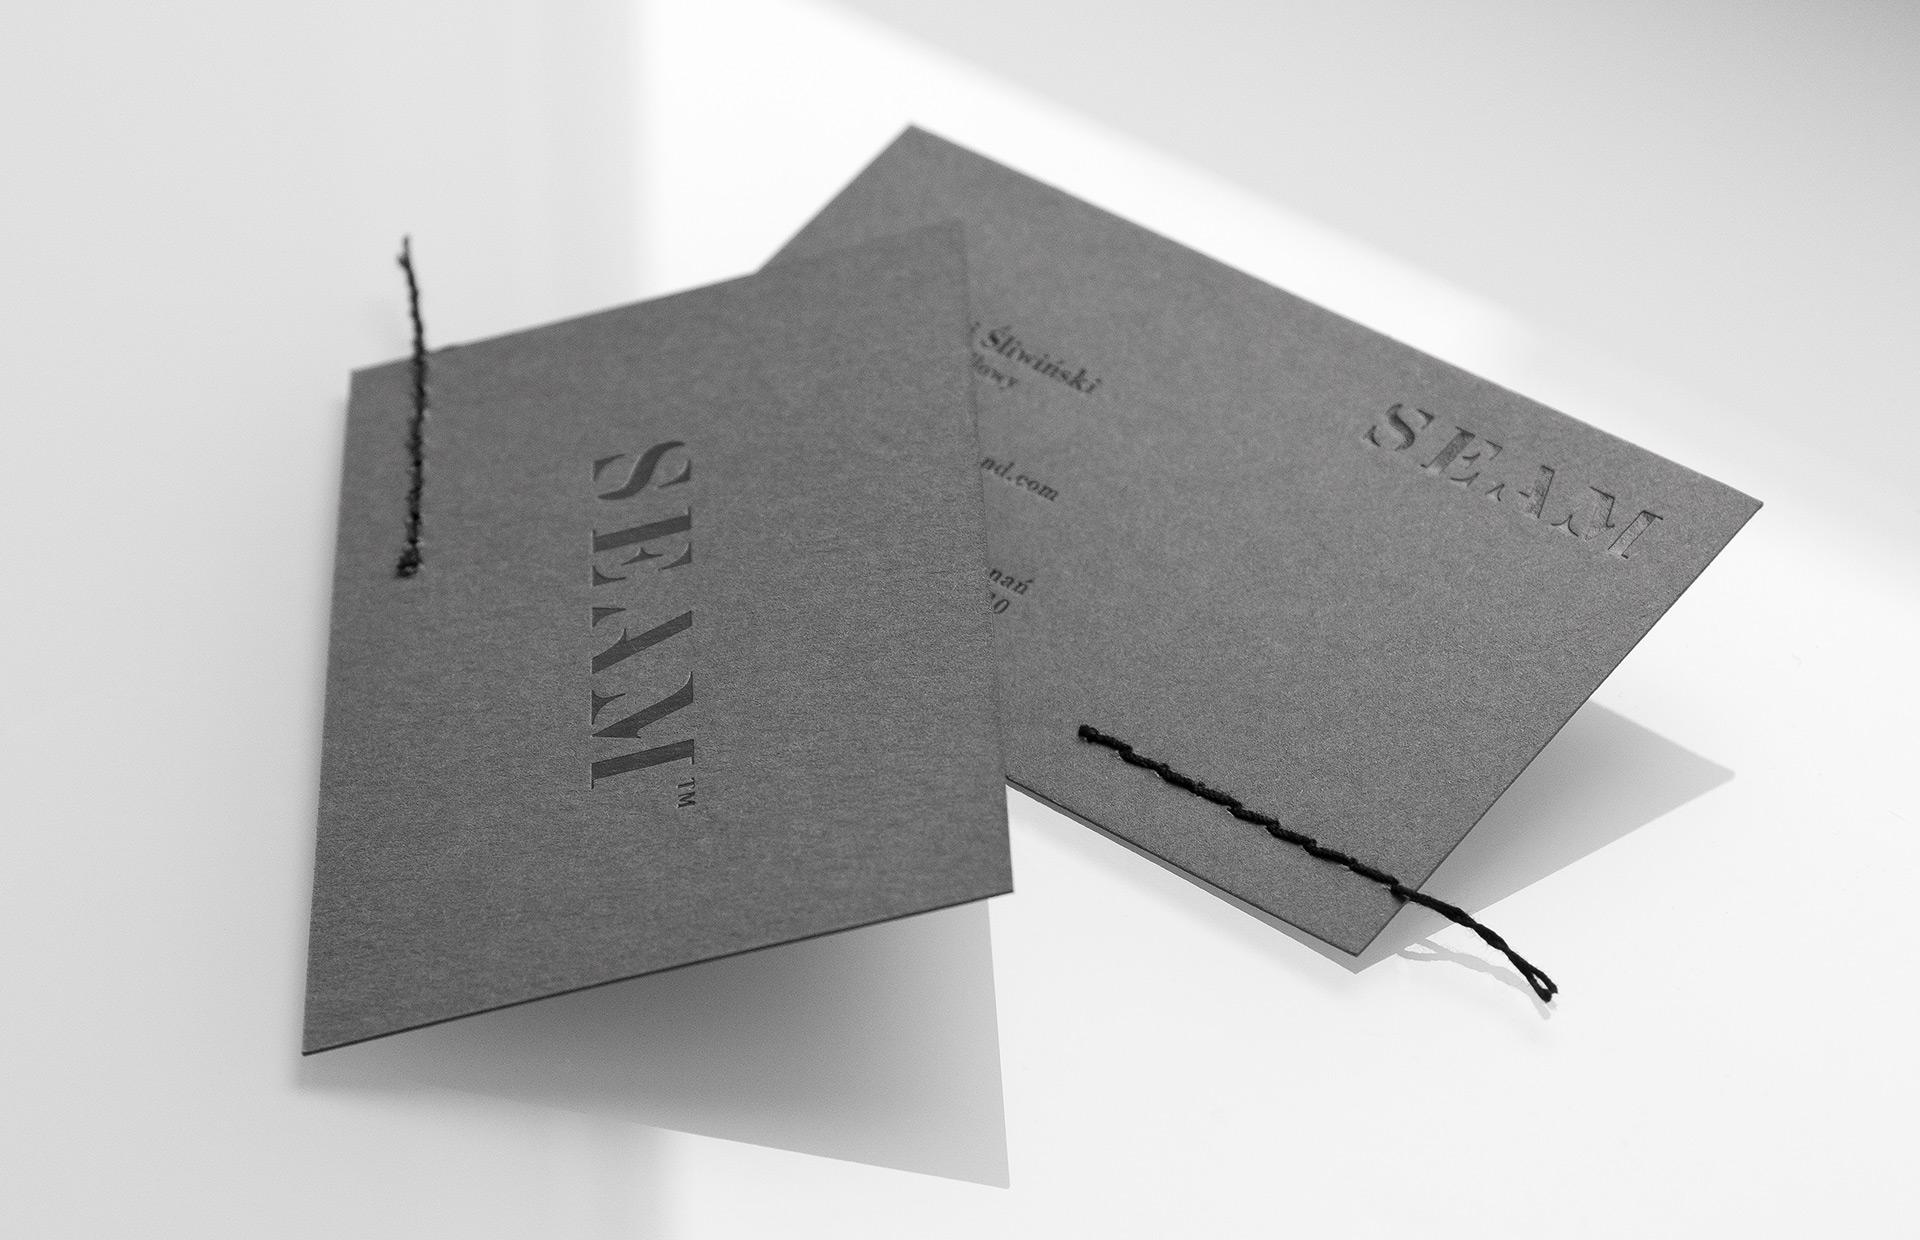 Seam - For brands studio.